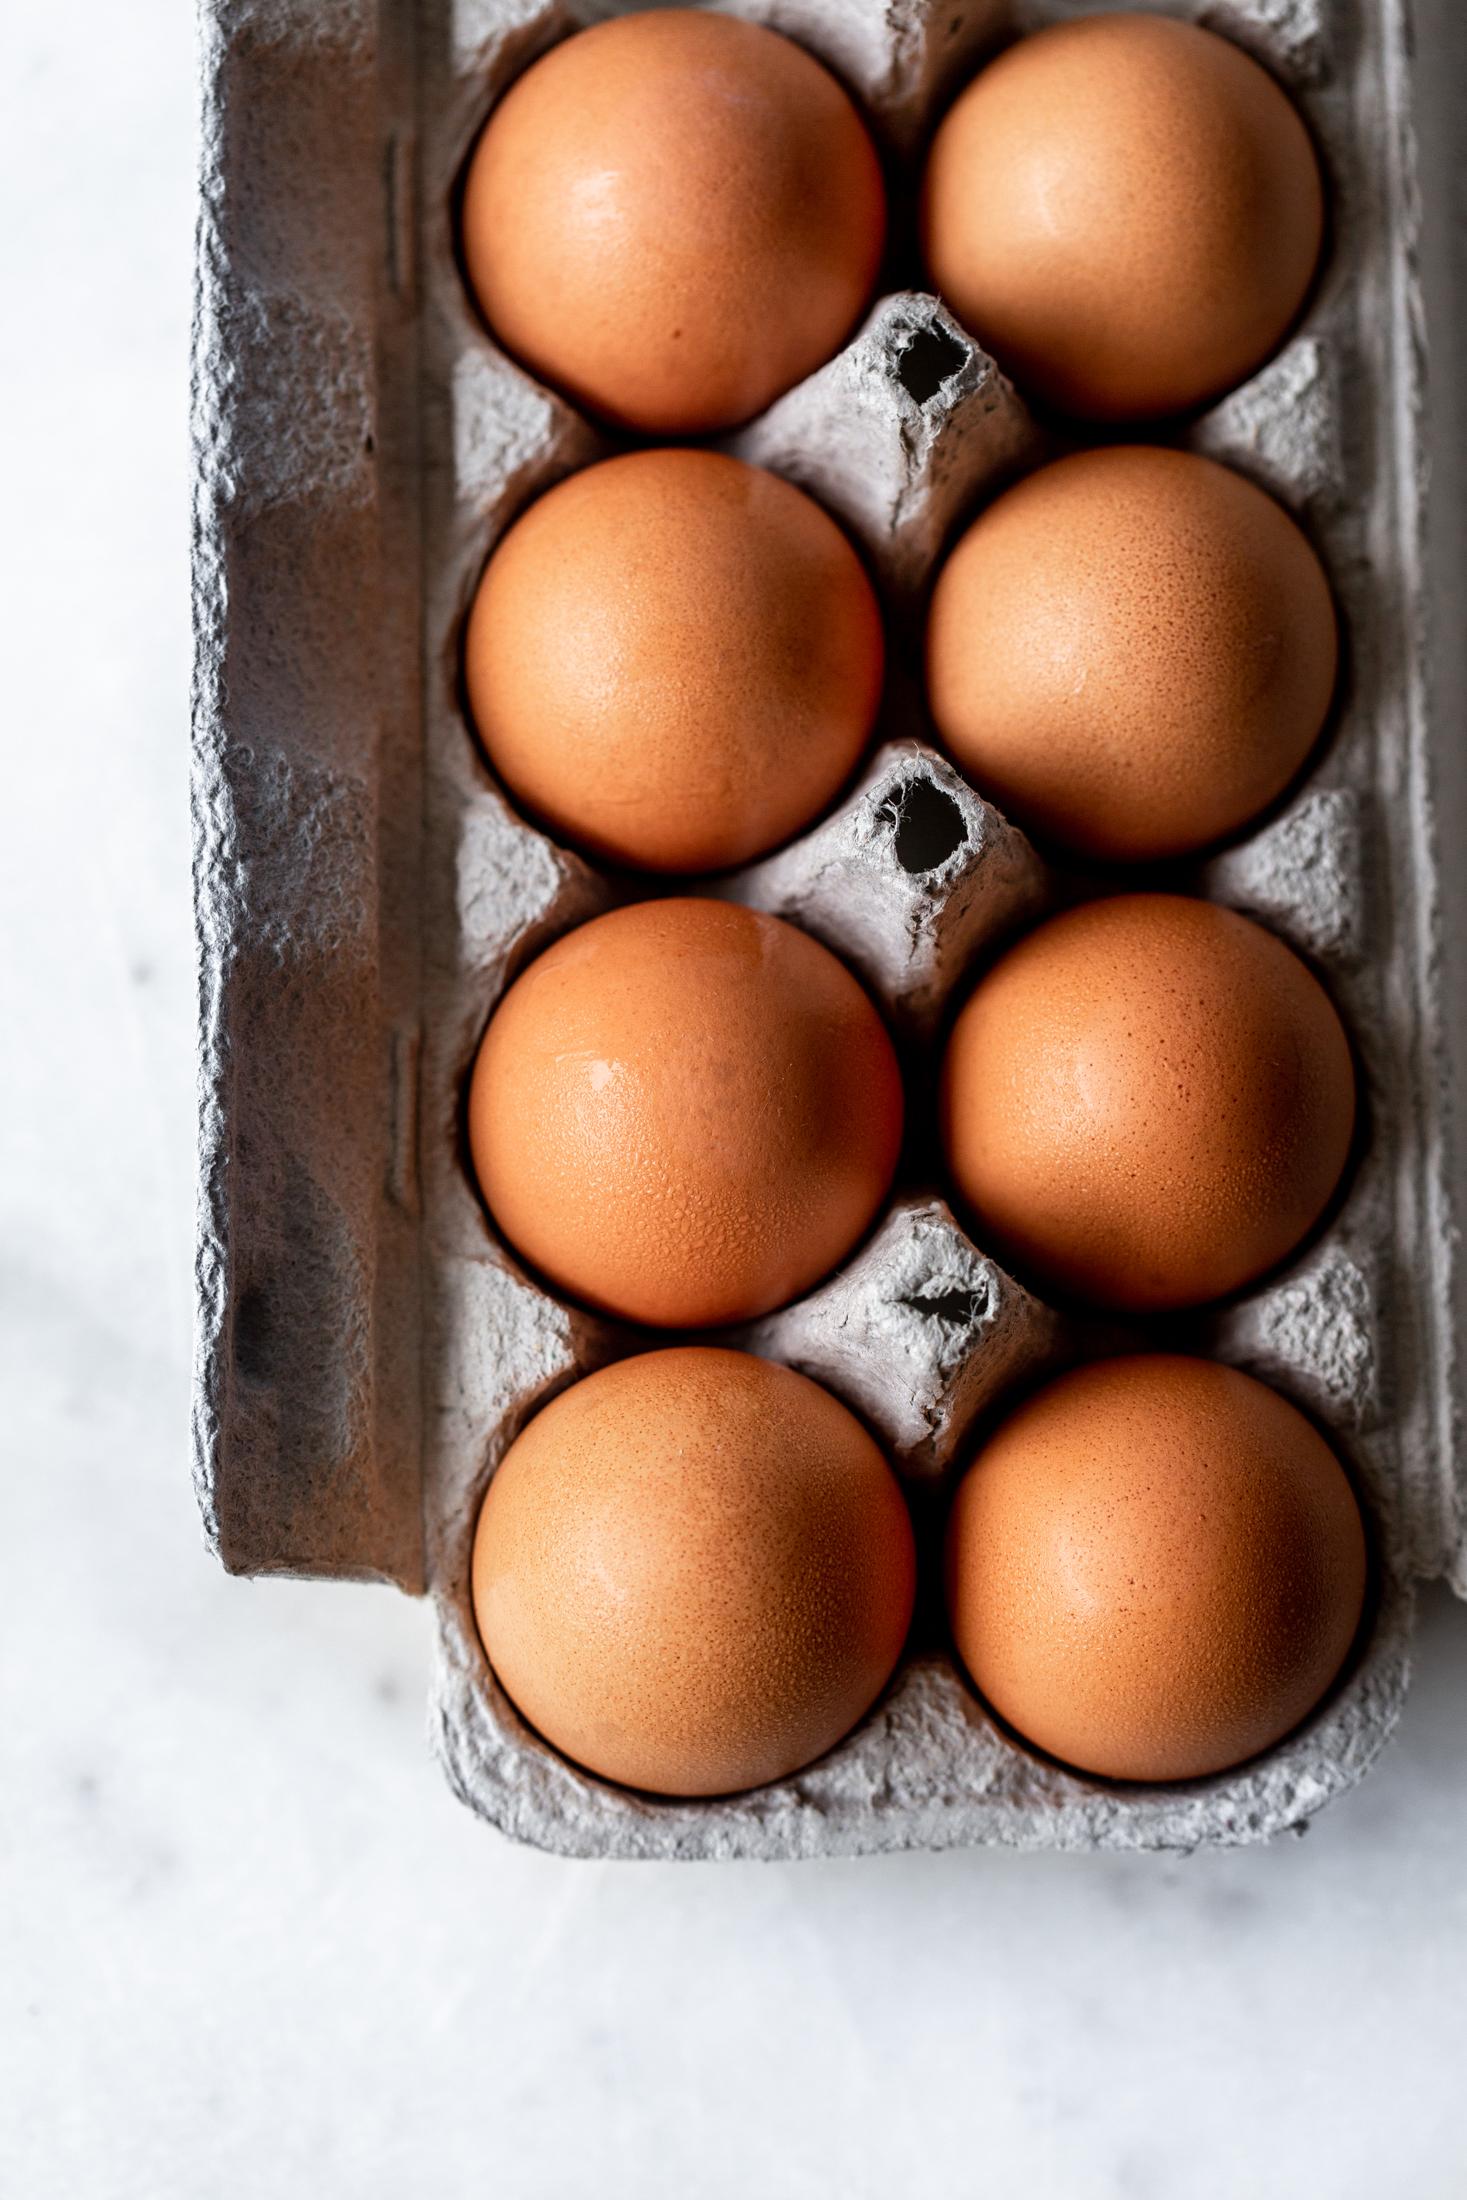 eggs ingredient shot